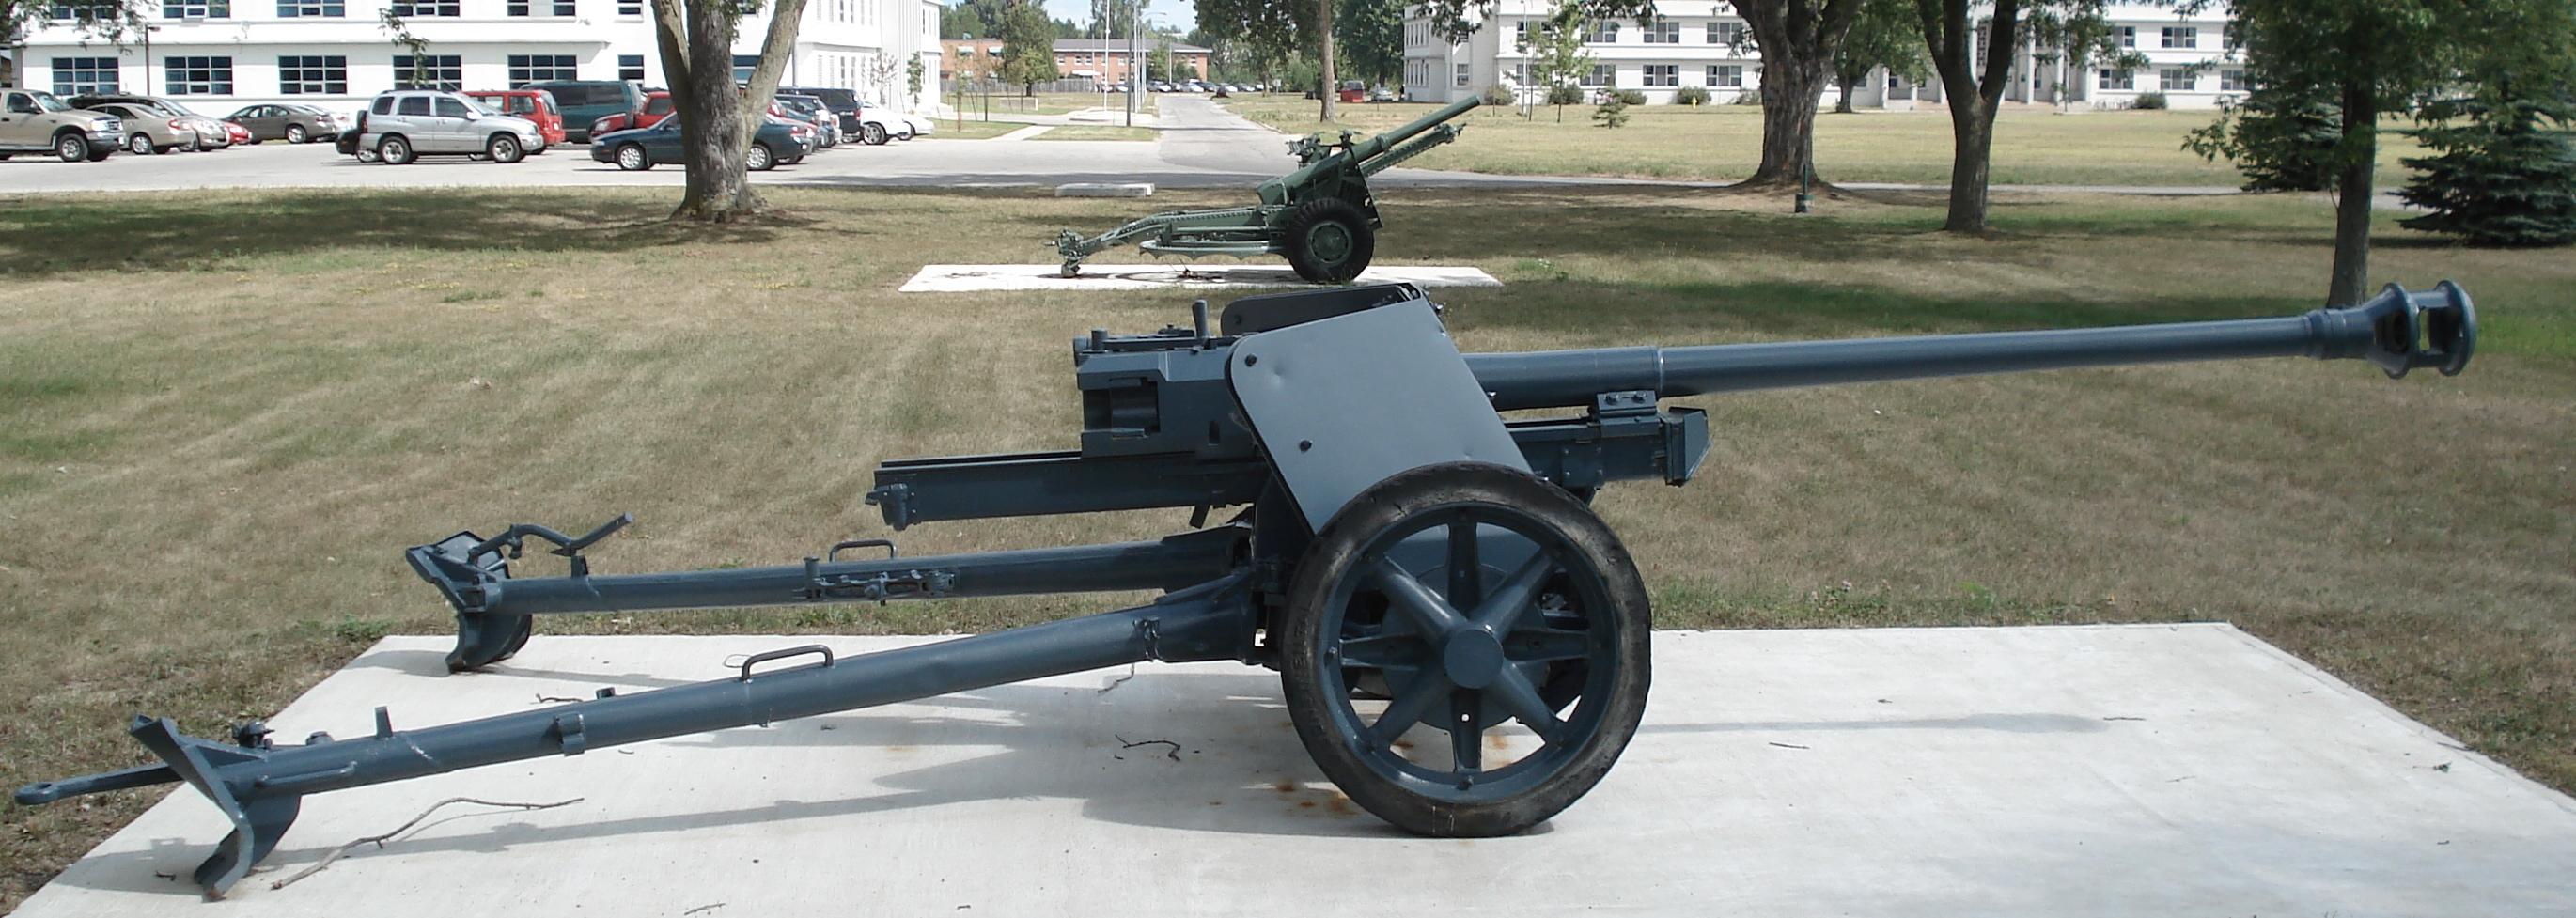 German 50 Mm Anti Tank Gun: 1:32 PAK 40 Anti-Tank Gun With 6 Soldiers [it6879]